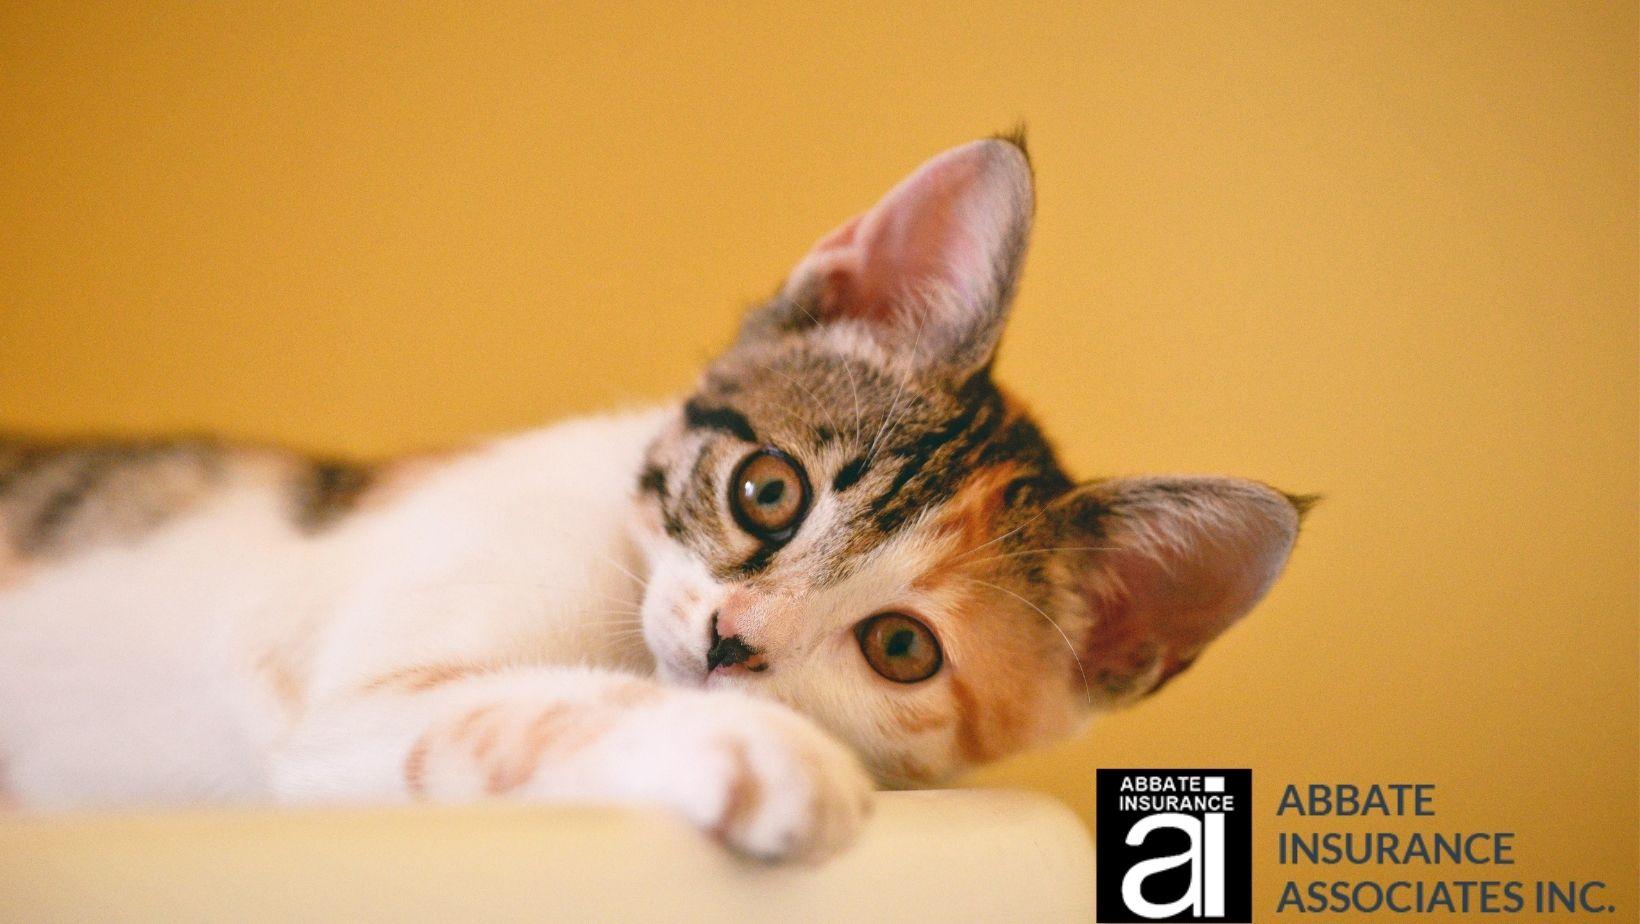 Pet Insurance by Abbate